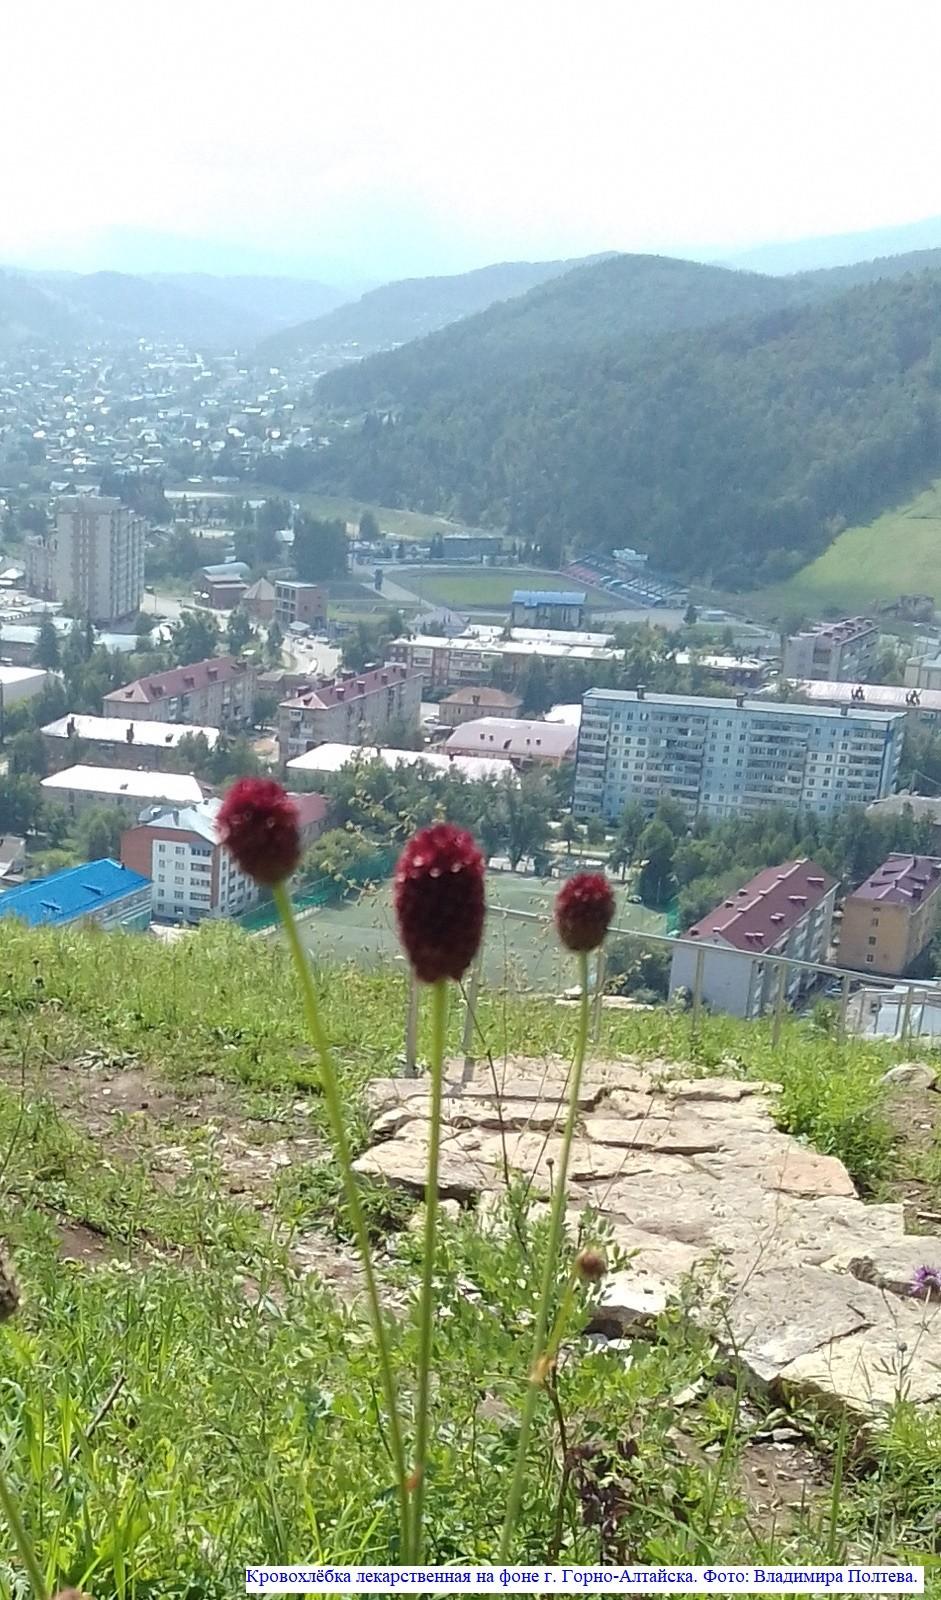 Кровохлёбка лекарственная на фоне г. Горно-Алтайска.